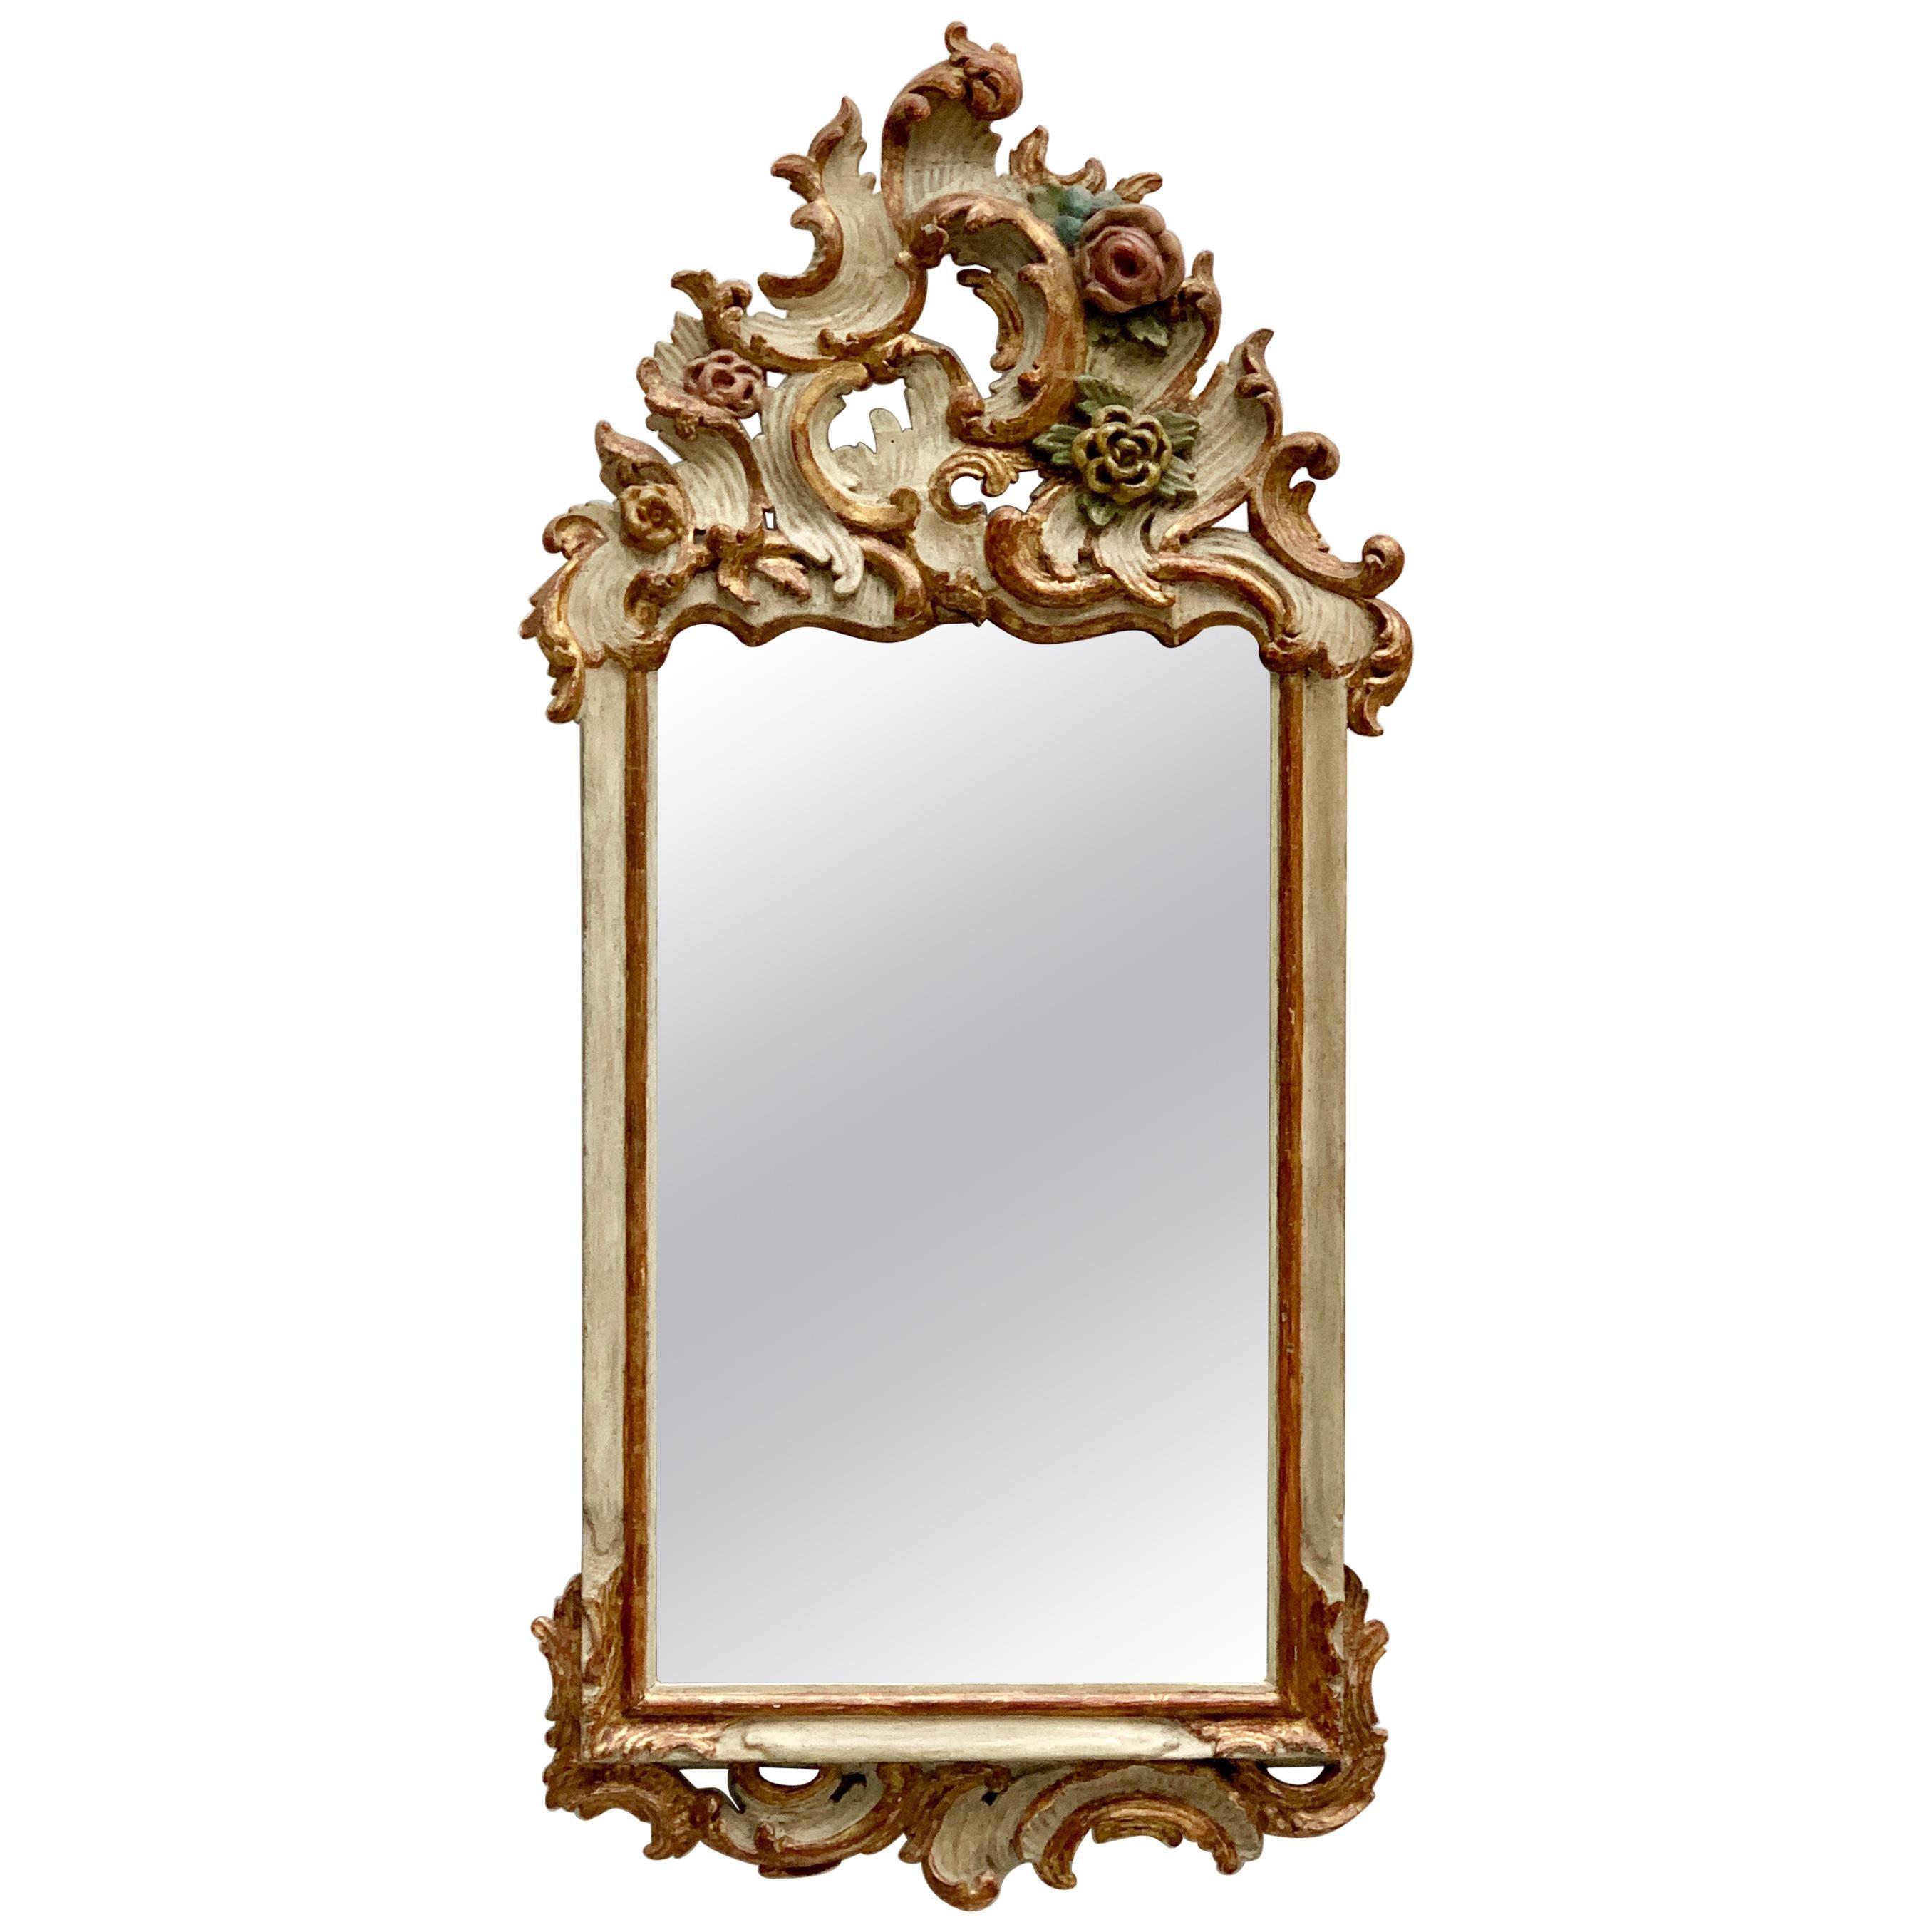 German 18th Century Rococo Mirror, Bavaria, White Painted